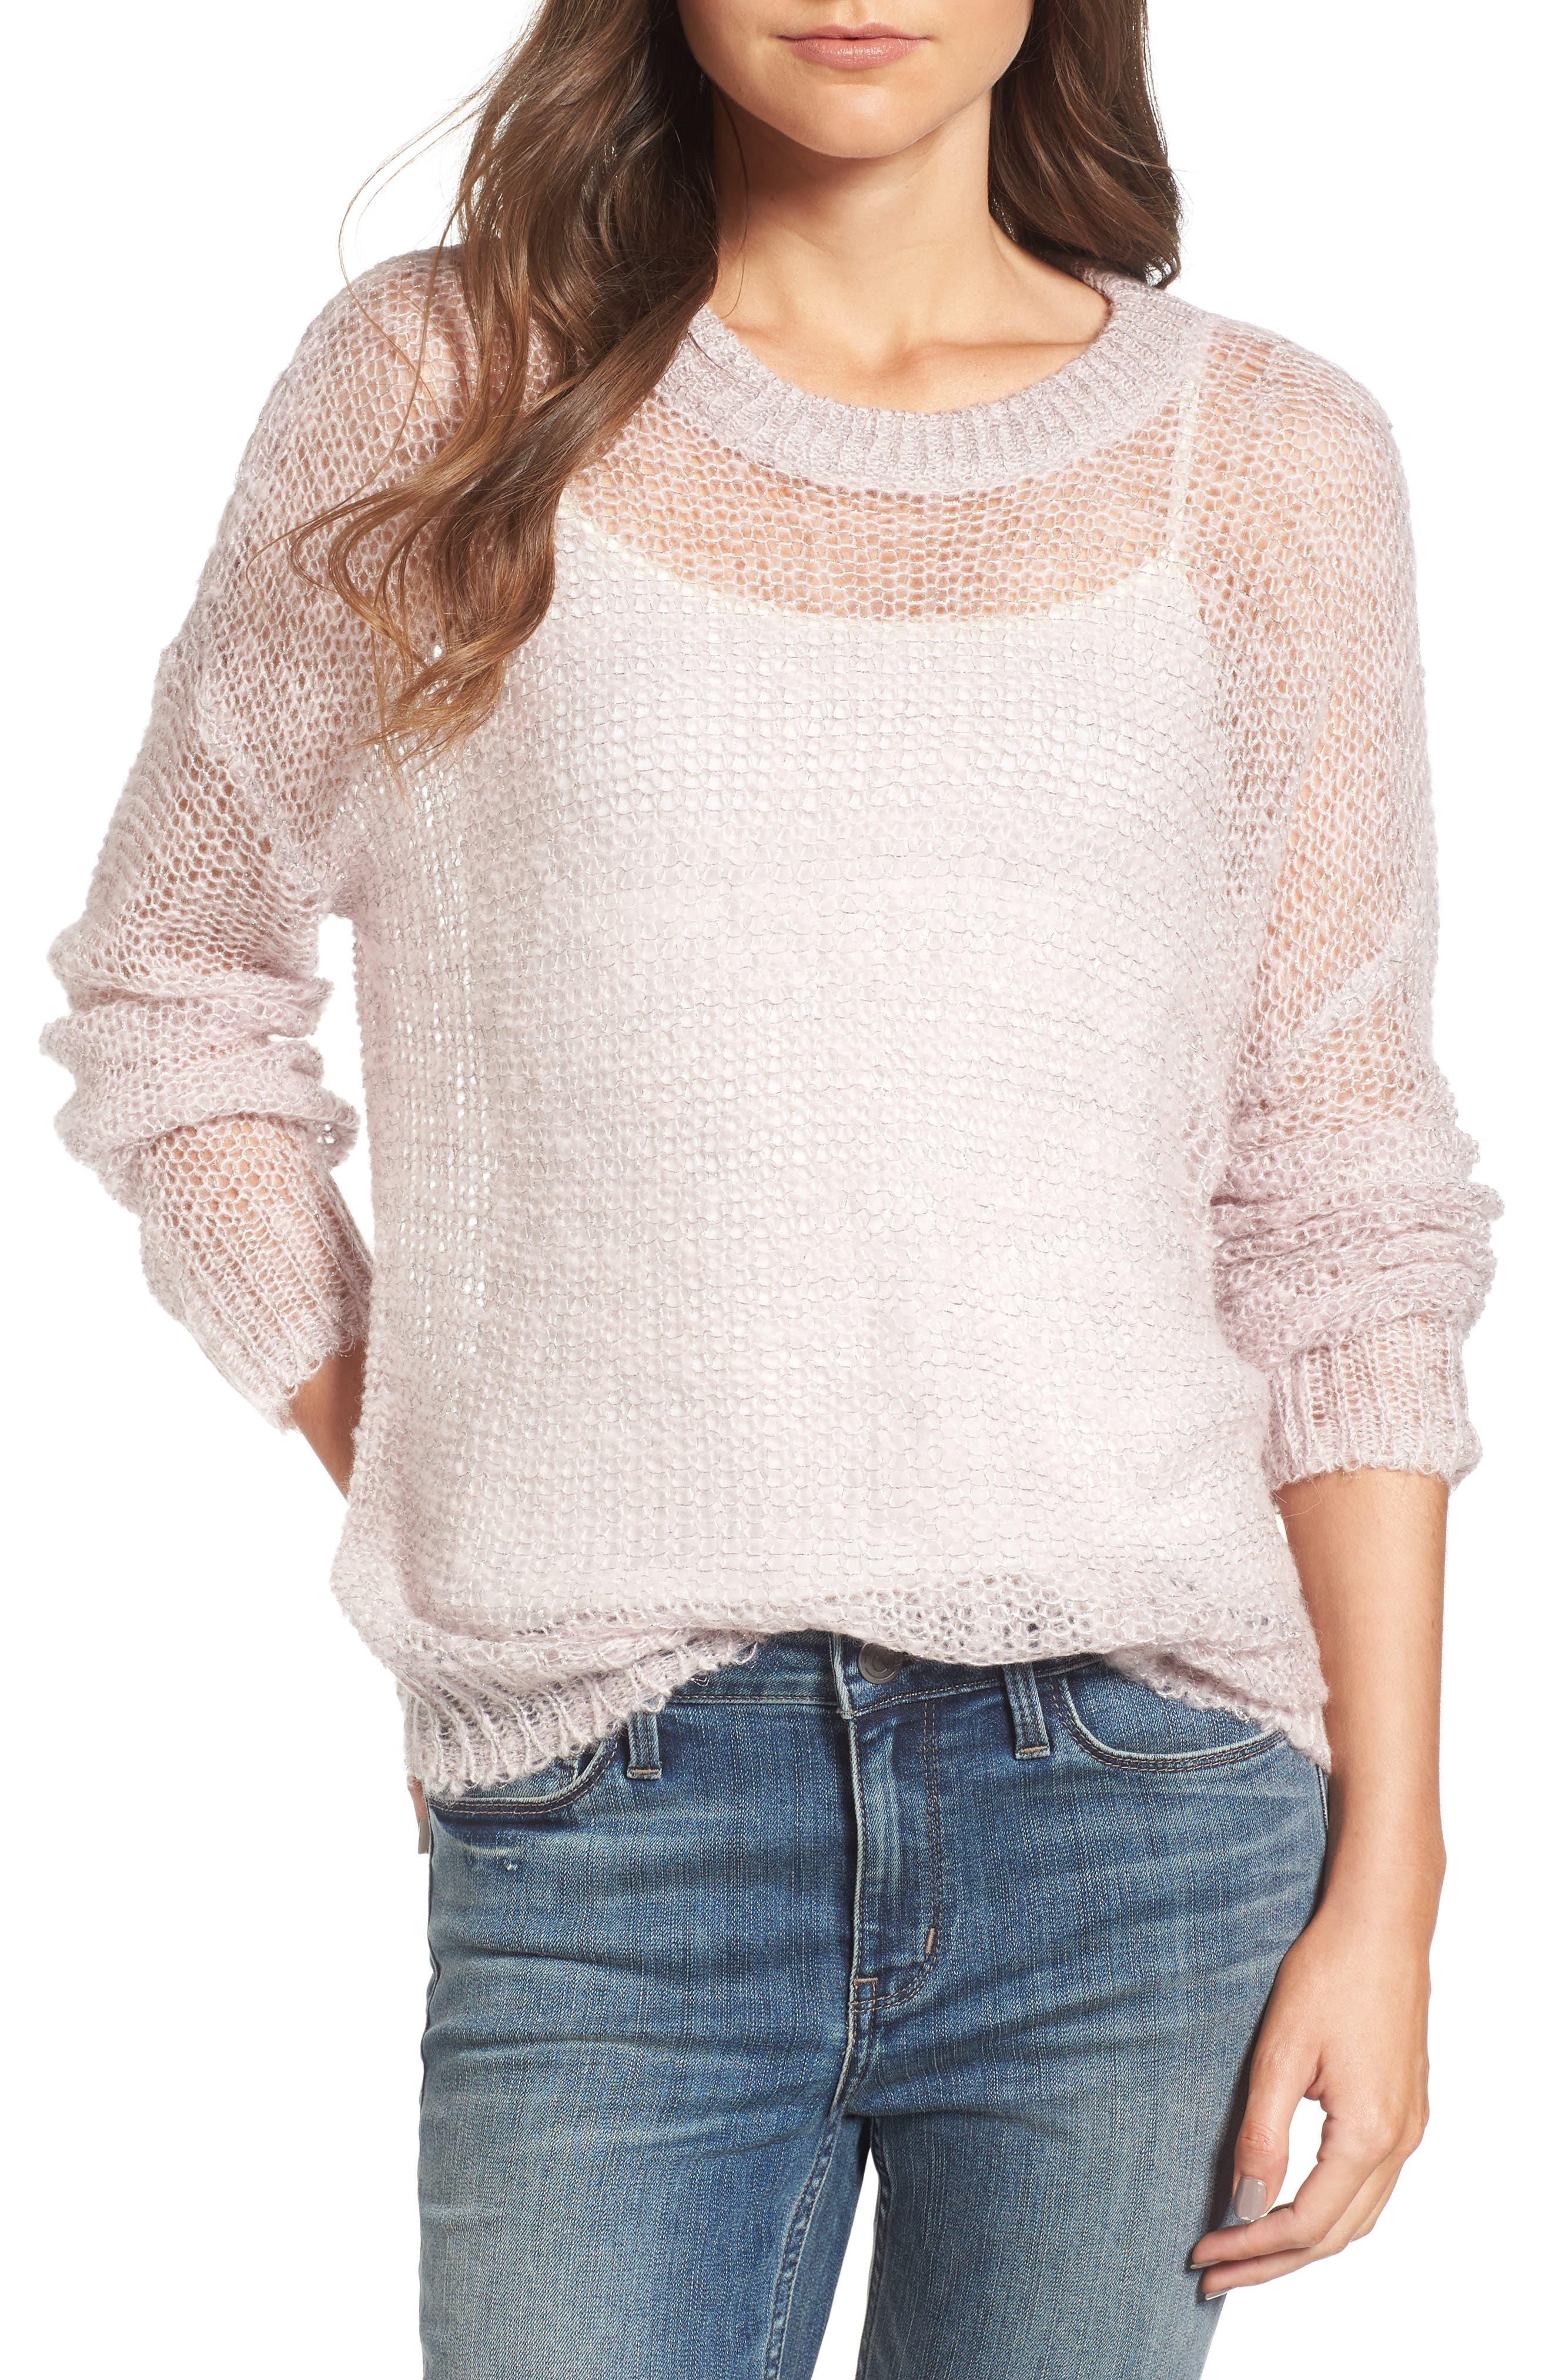 x Something Navy Sheer Metallic Sweater,                         Main,                         color, Pink Parfait Combo